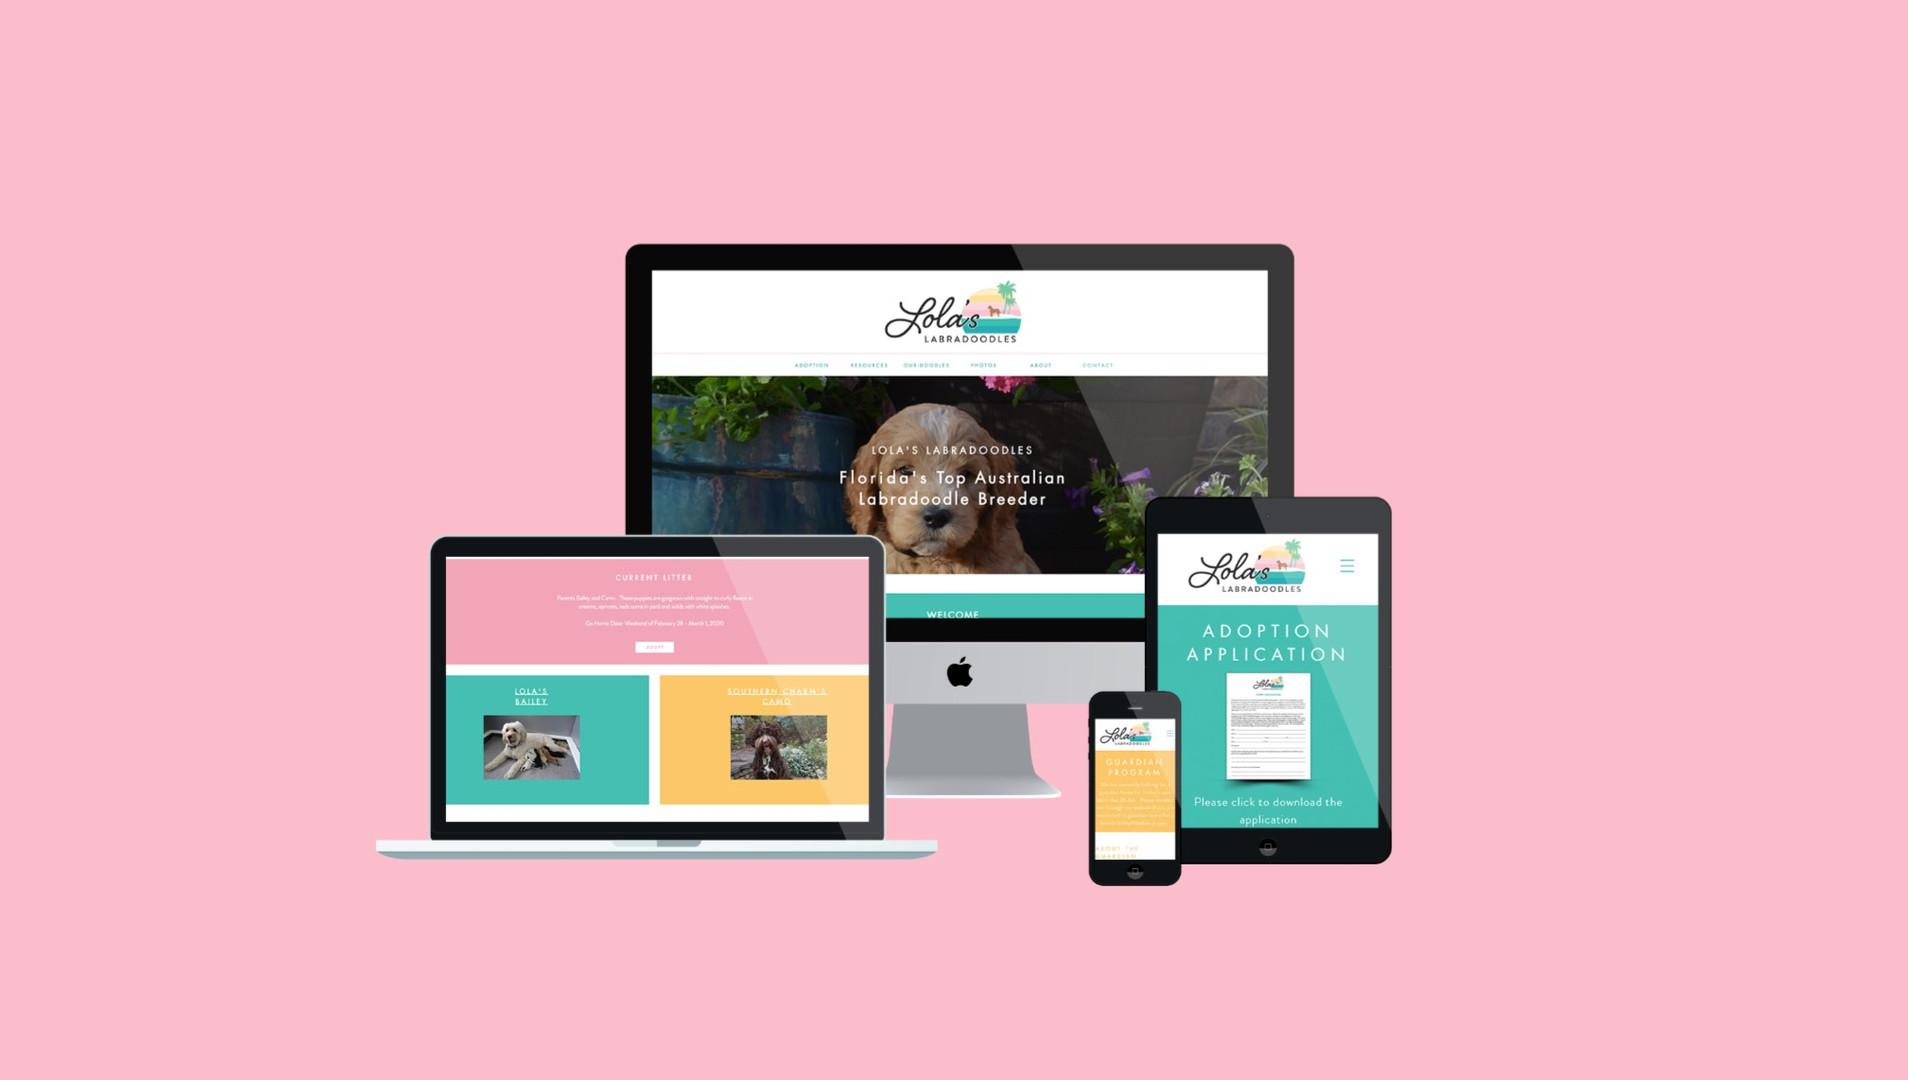 lolas labradooble website design logo design